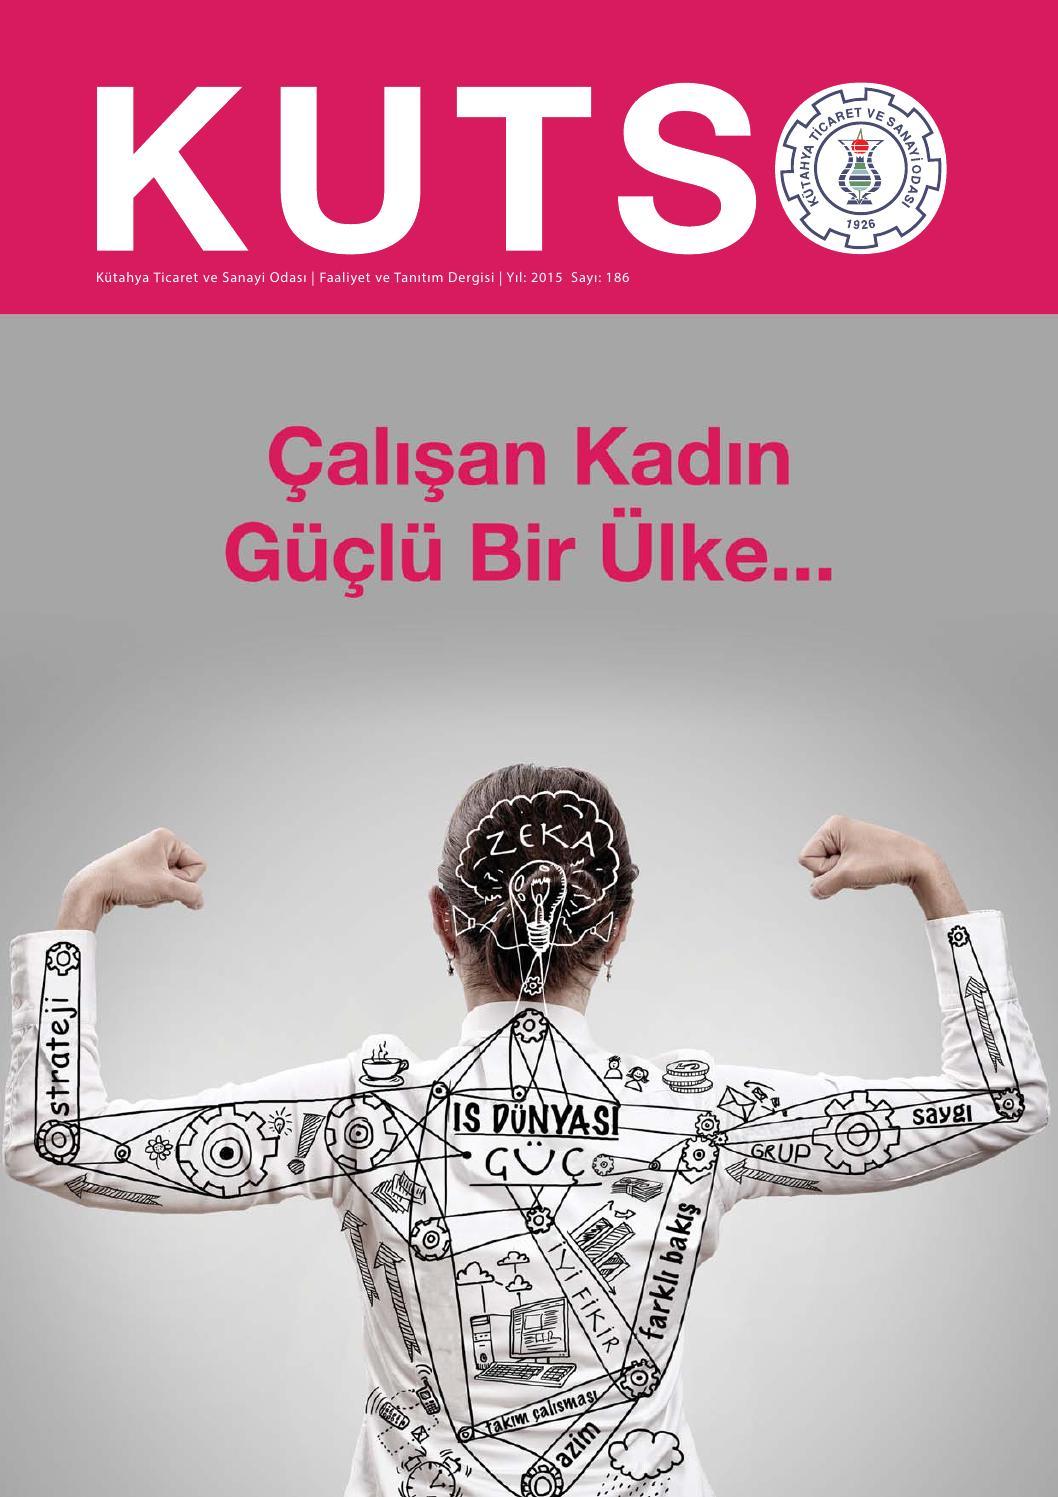 Kutso Dergi Sayi 186 By Kutahya Ticaret Ve Sanayi Odasi Issuu